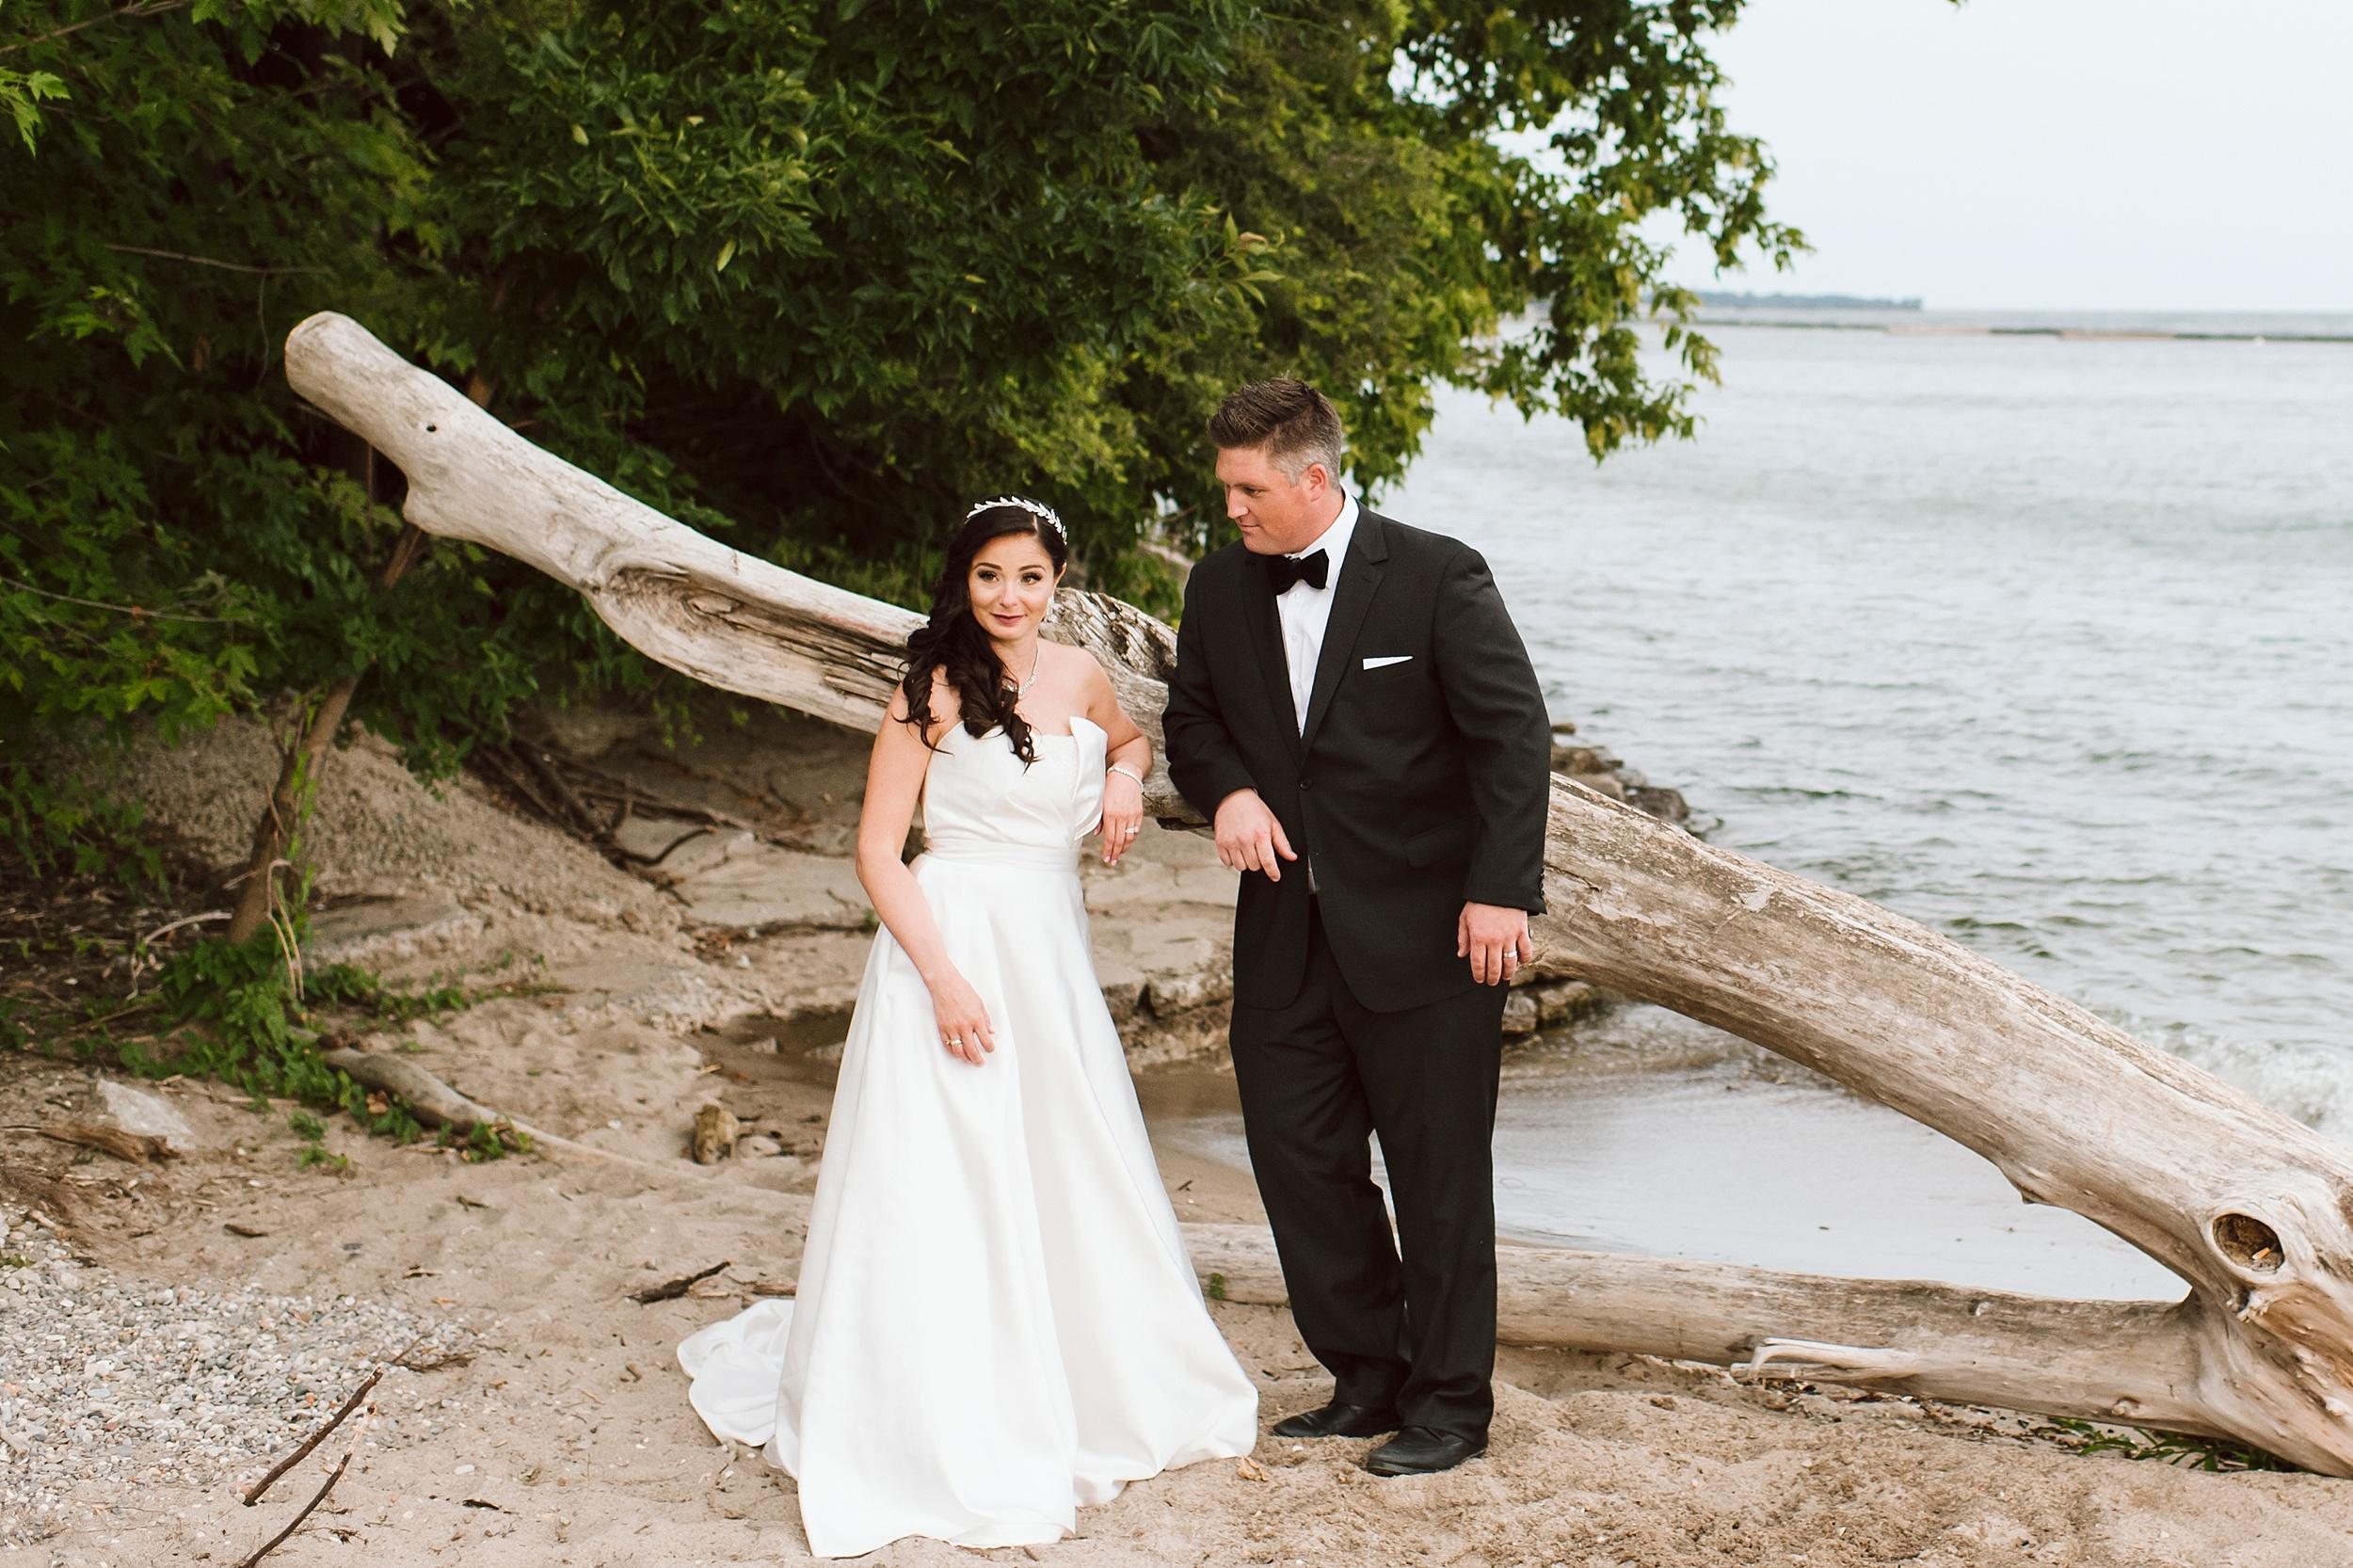 Sunnyside_Pavilion_Wedding_Toronto_Photographer_0071.jpg